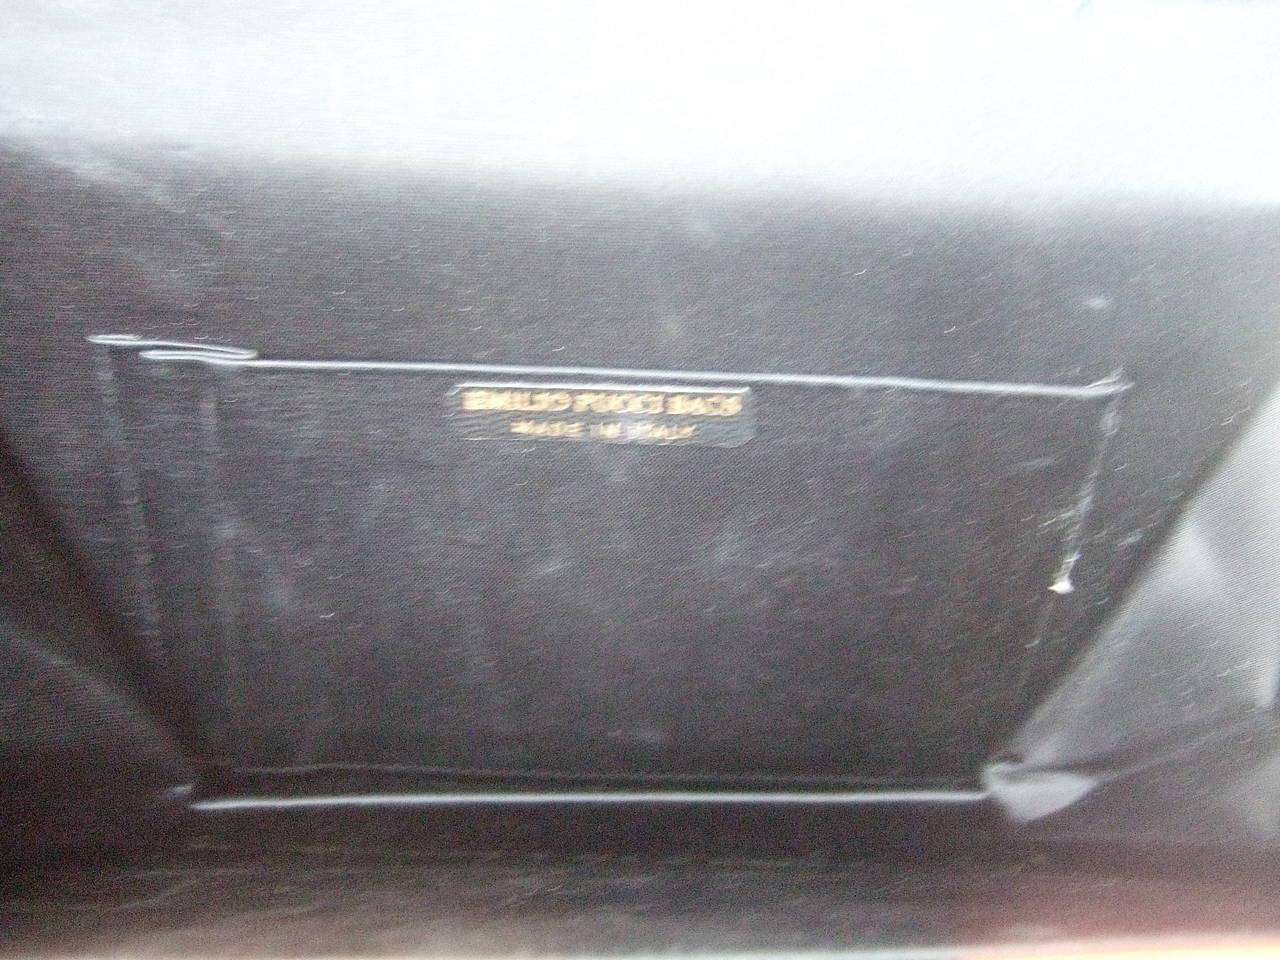 Emilio Pucci Italy Silk Diminutive Envelope Style Handbag c 1970 For Sale 5